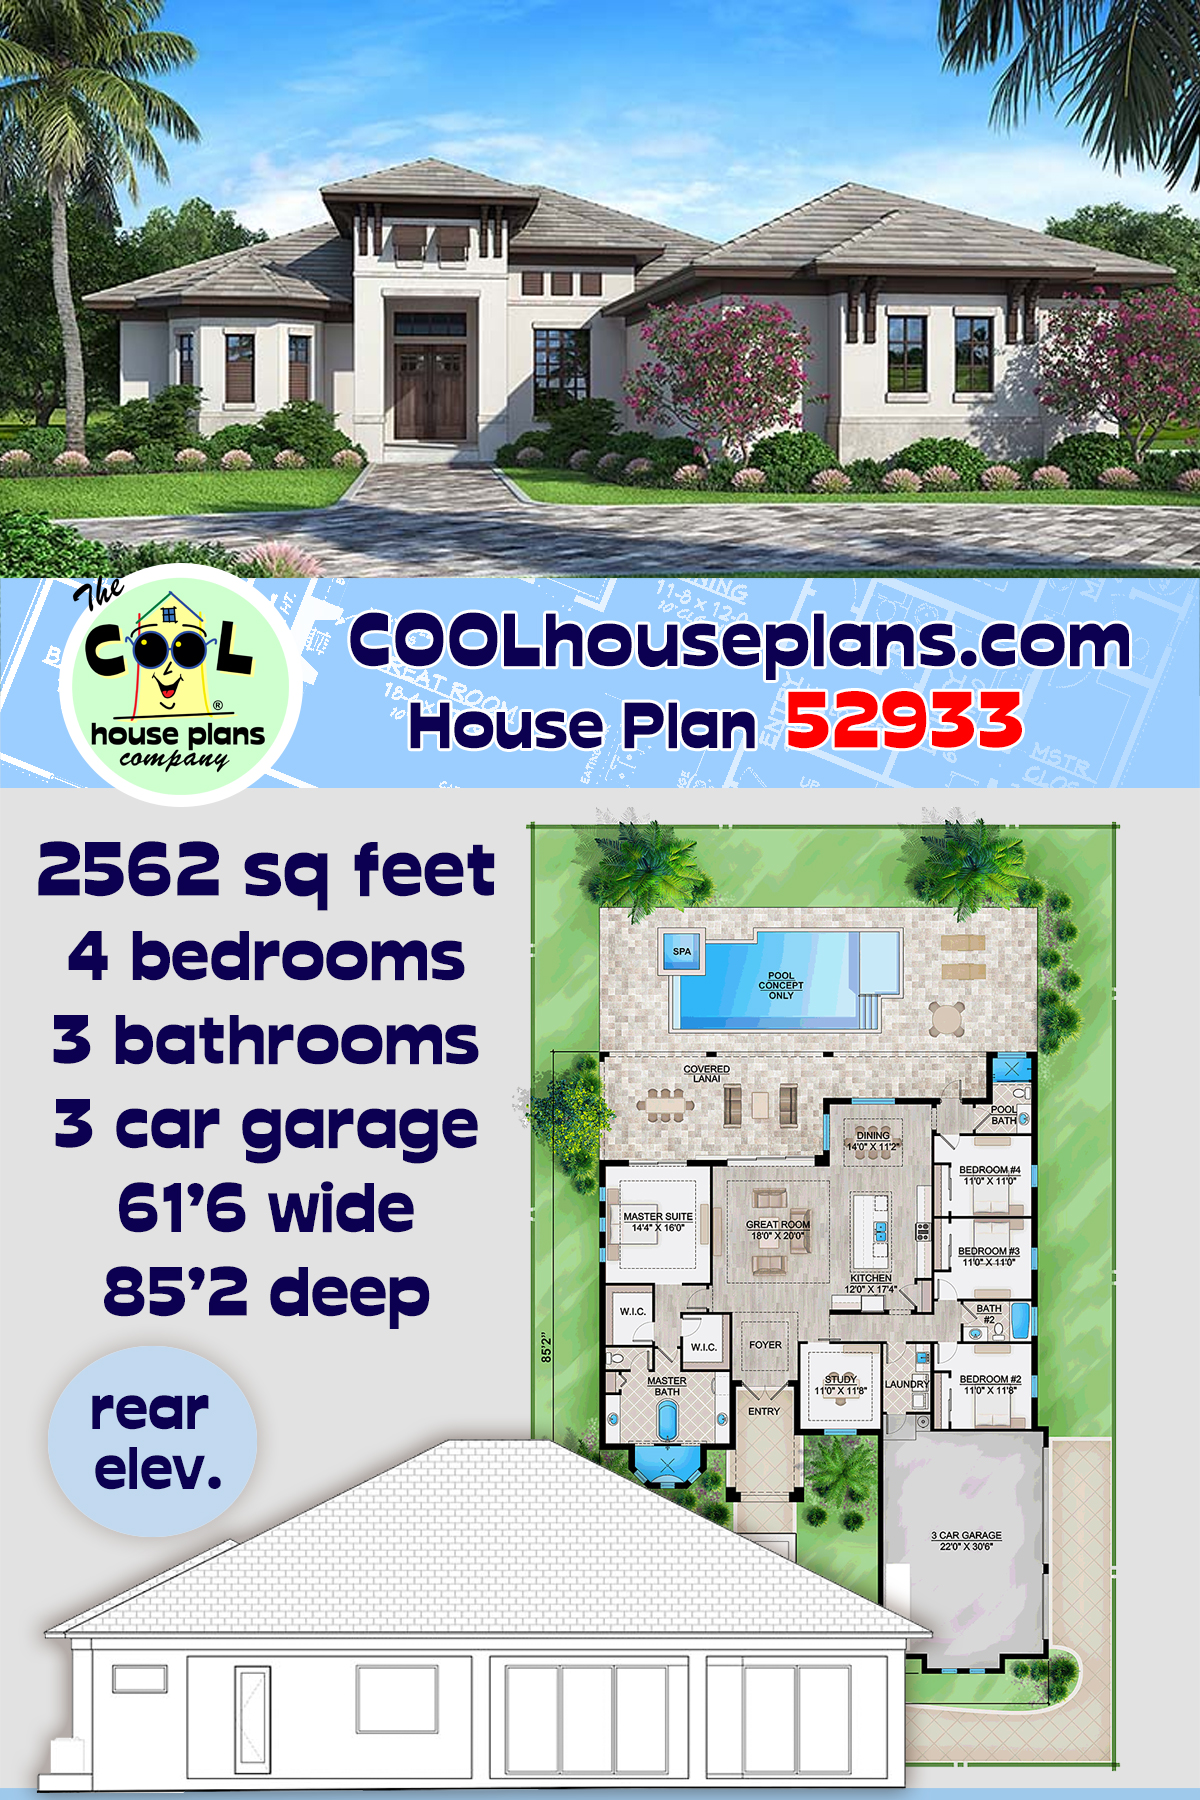 Coastal, Florida, Mediterranean House Plan 52933 with 4 Beds, 3 Baths, 3 Car Garage